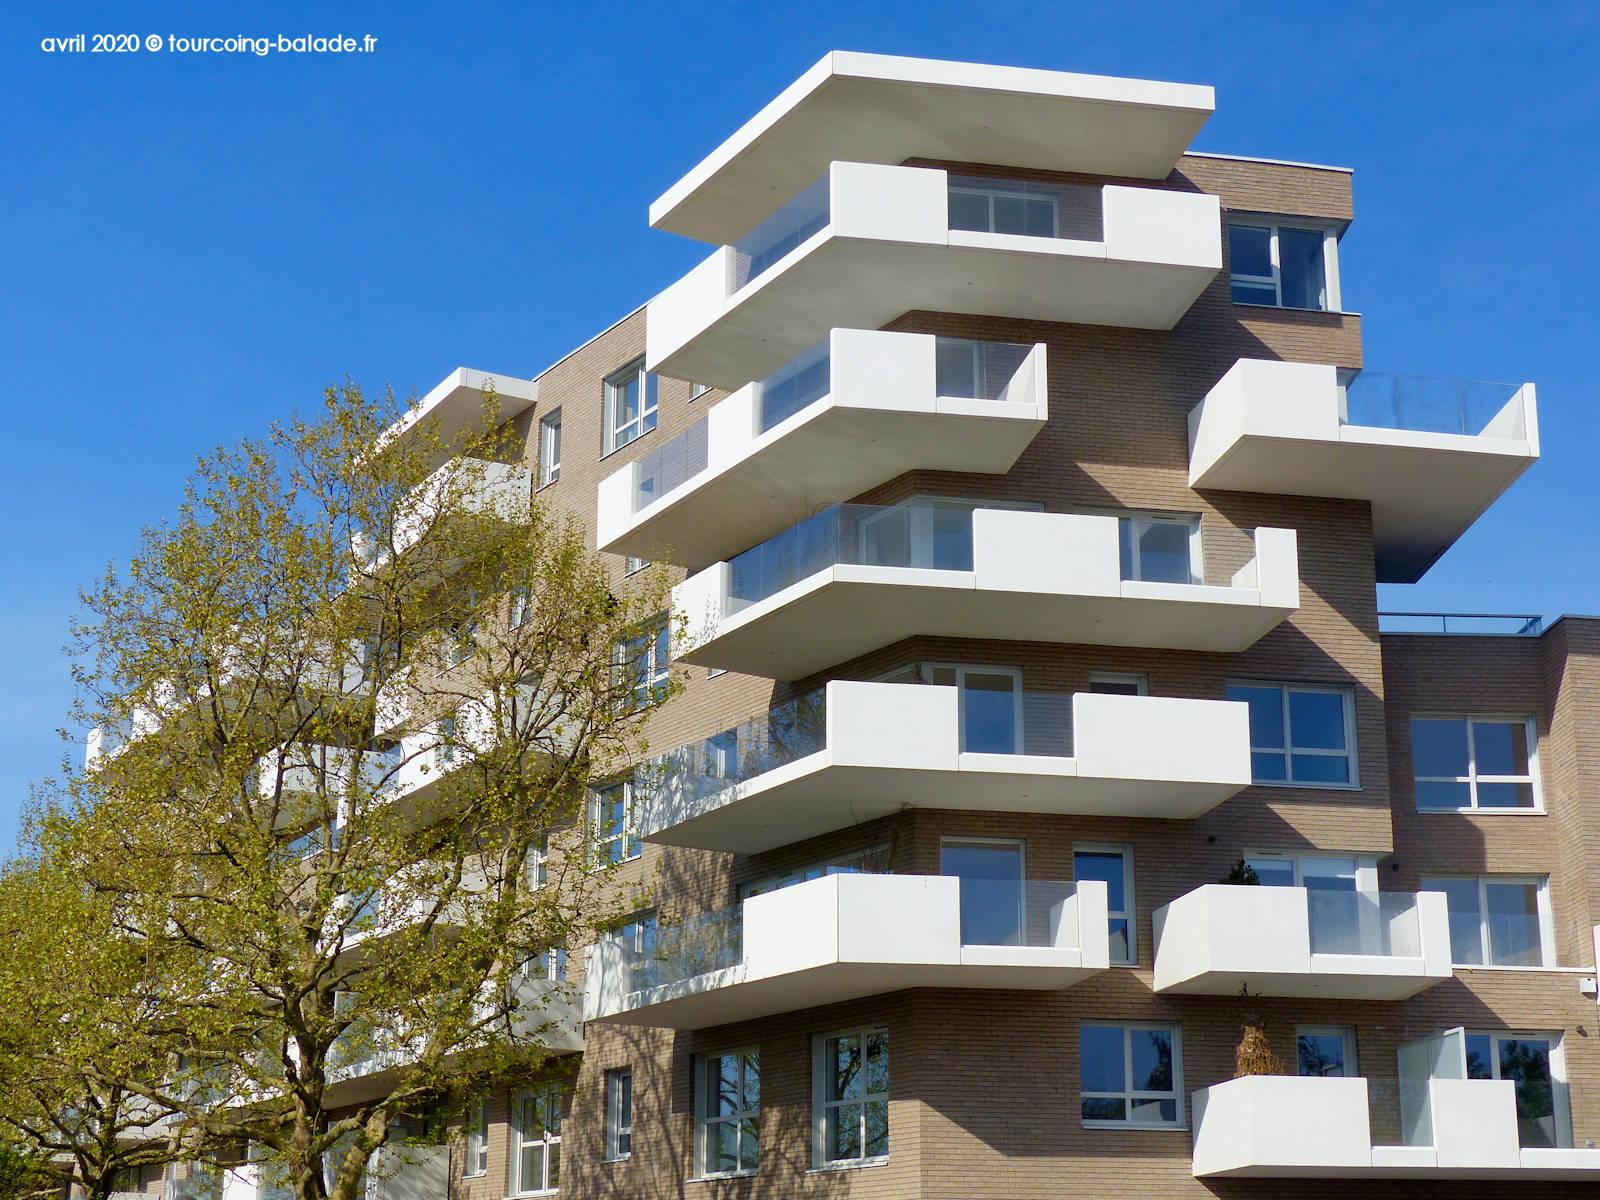 Balcons Résidence Equinox, Tourcoing 2020